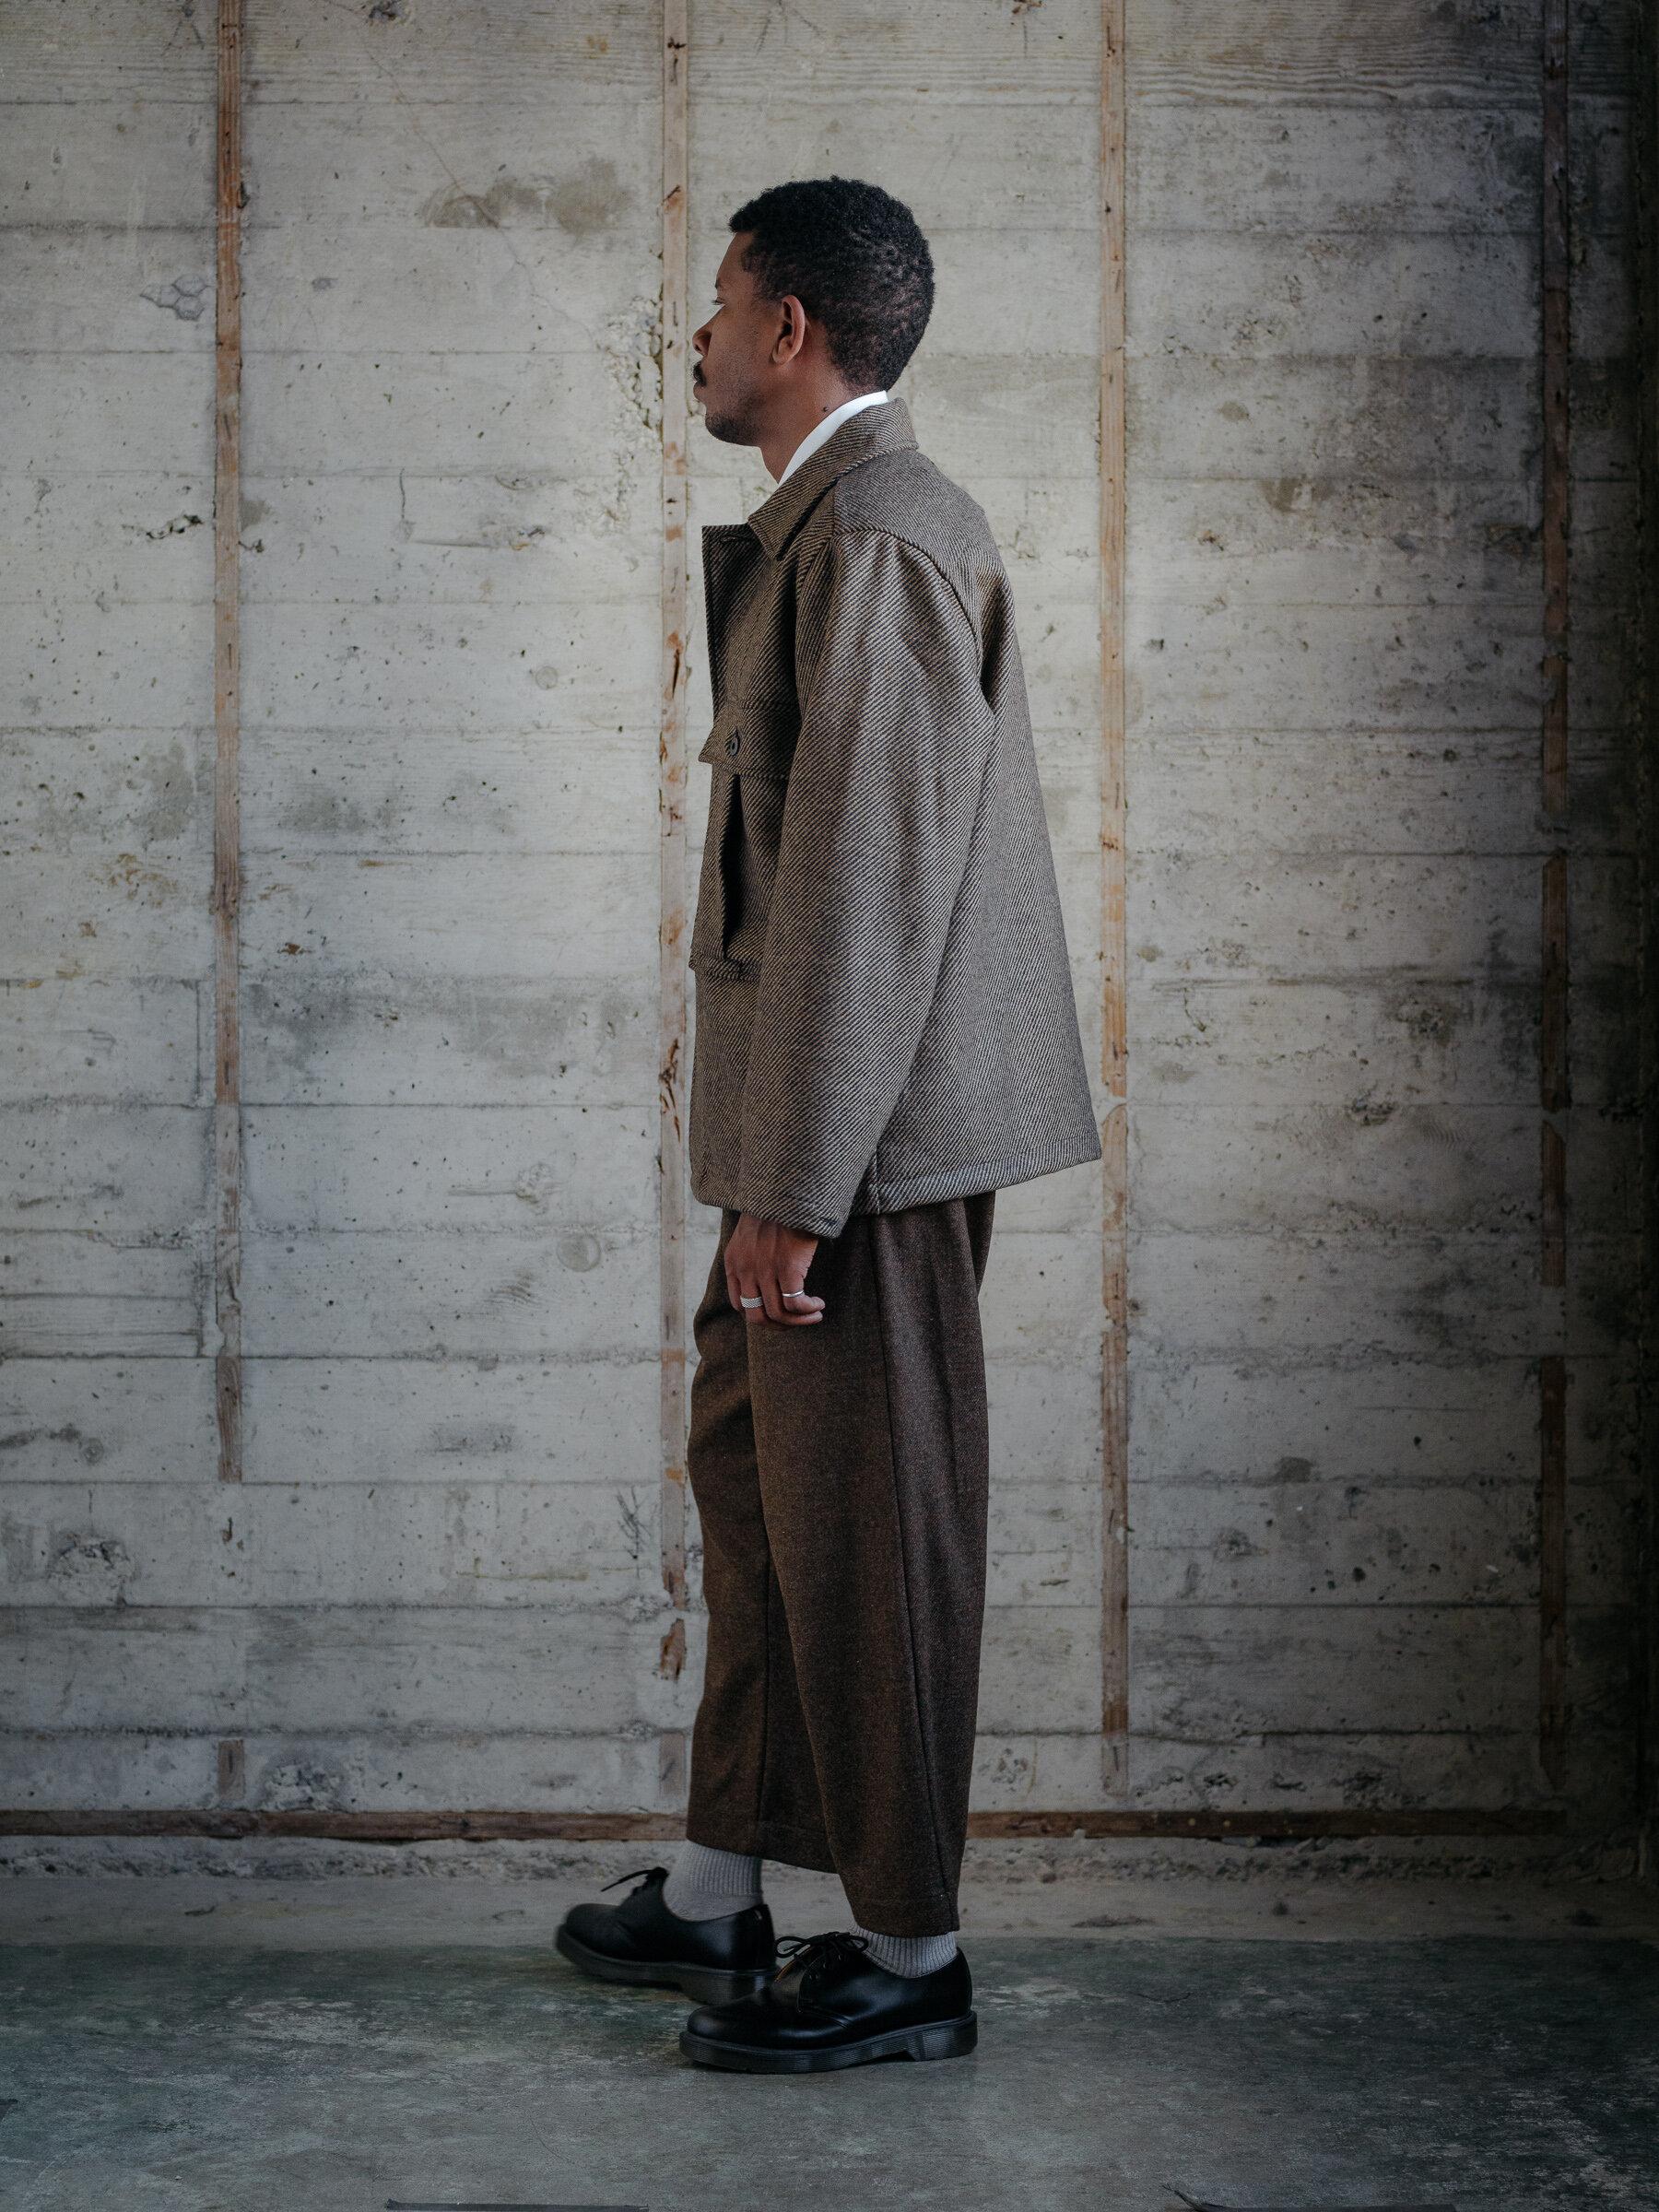 evan-kinori-bellow-pocket-jacket-lambswool-twill-woven-in-ireland-2